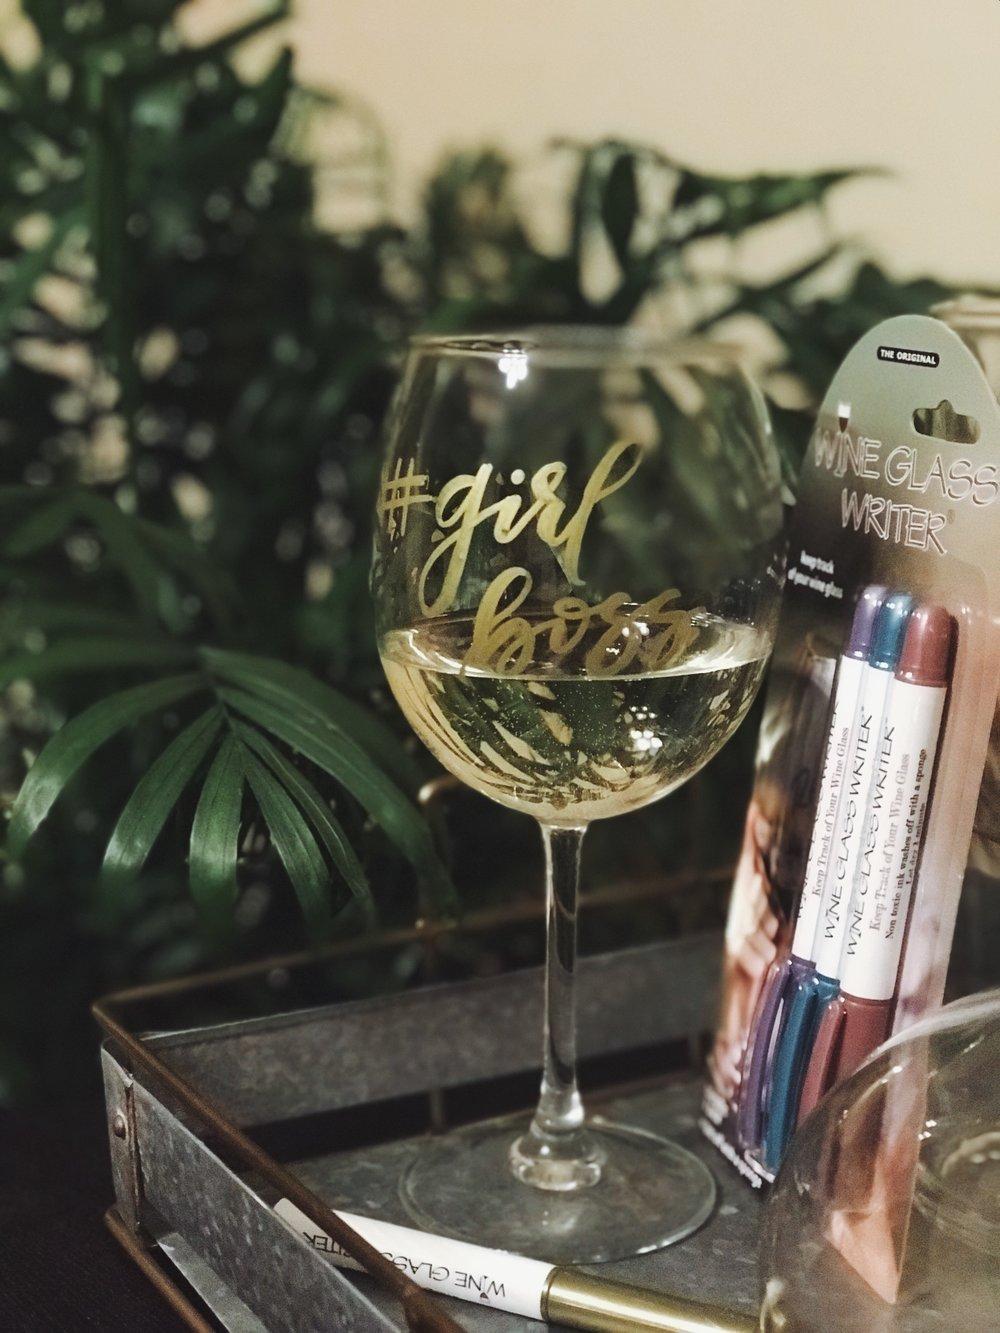 Wine-glass-writer.JPG